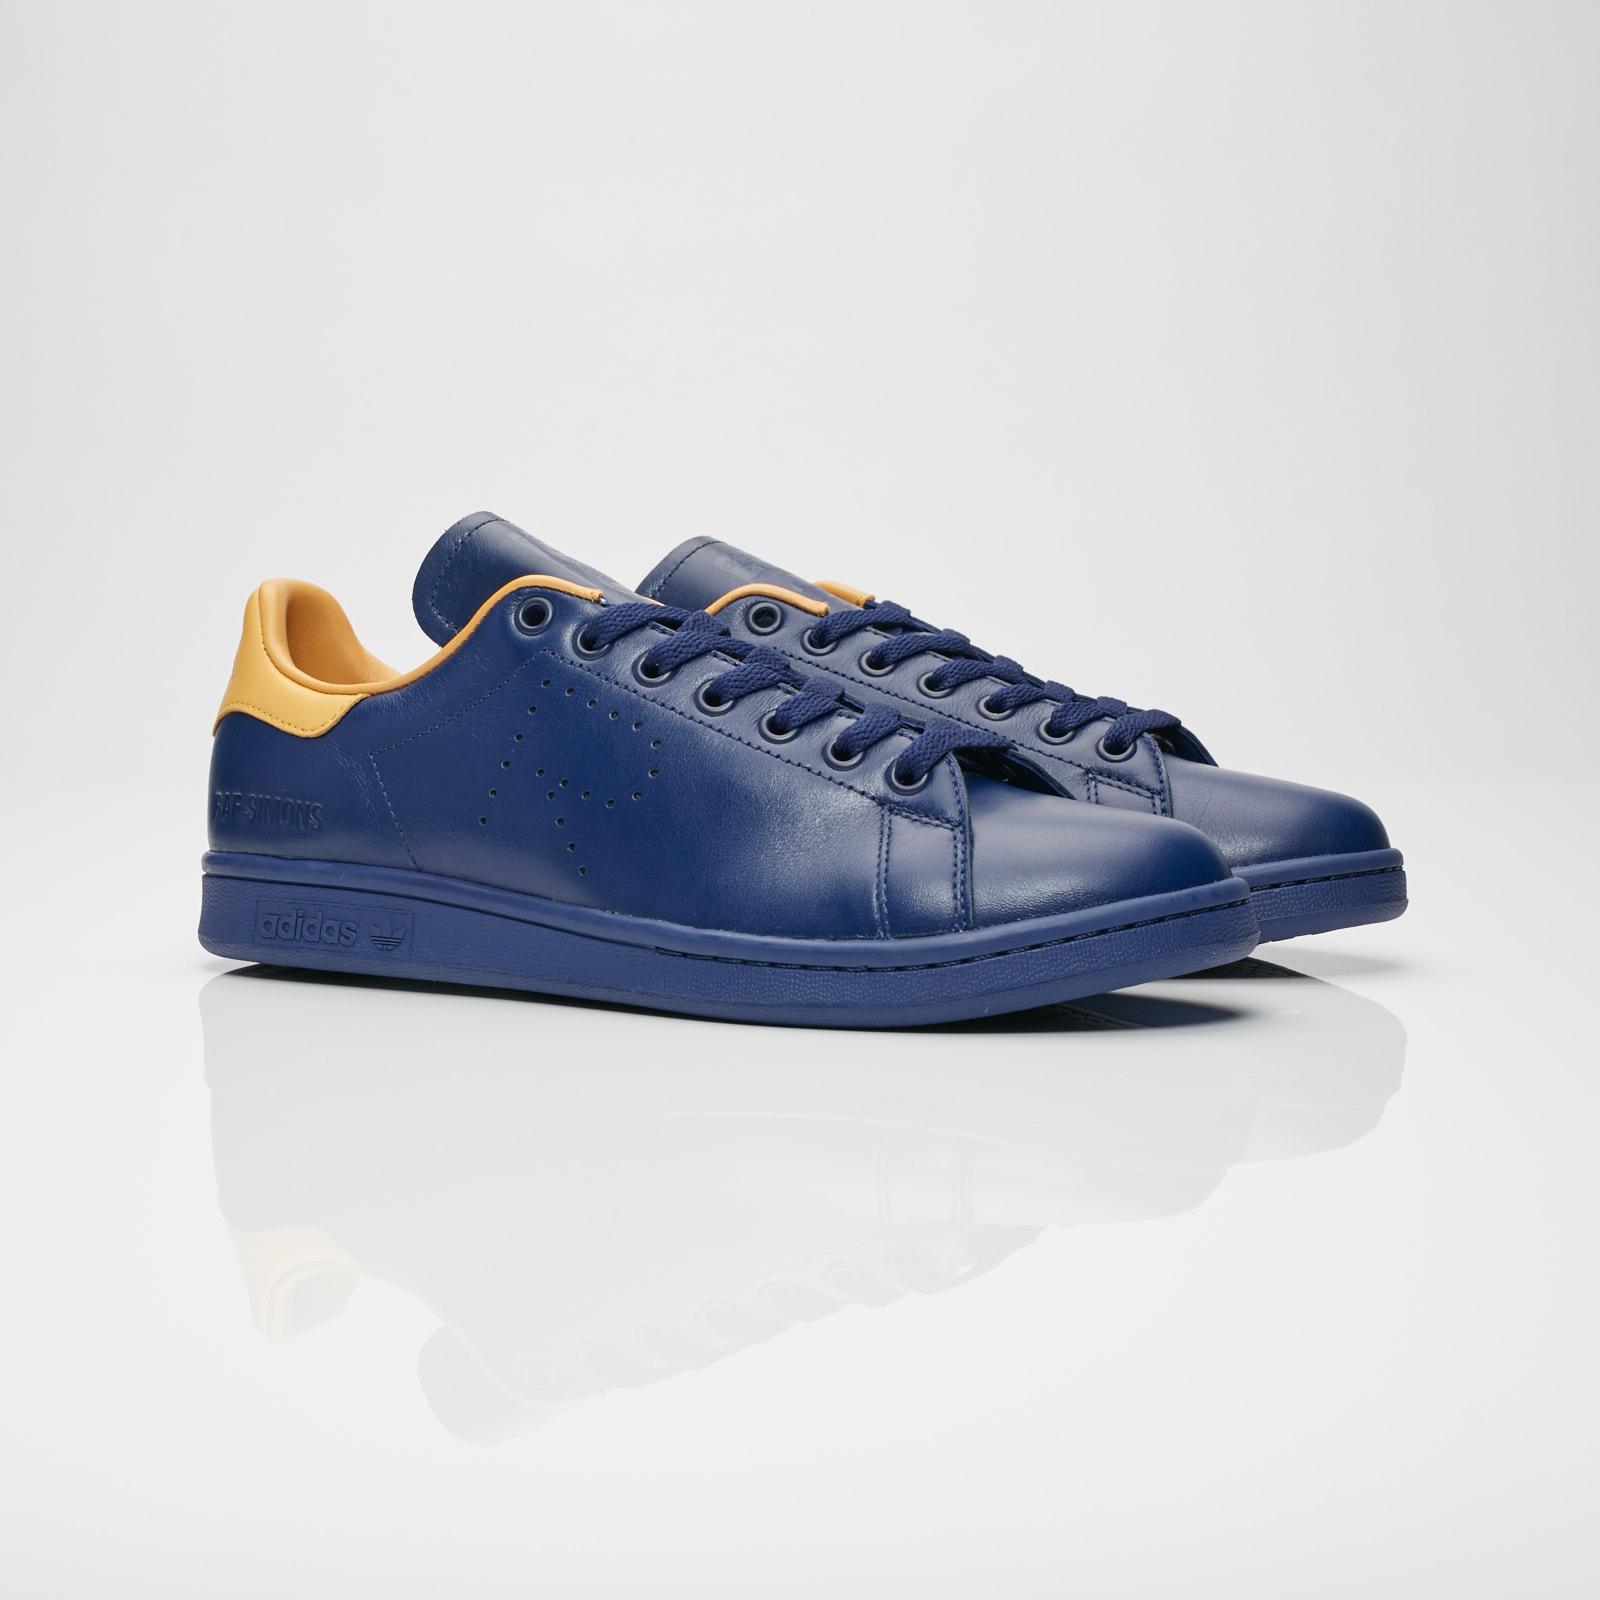 best service 5db3a 1ebb9 adidas stan smith blue orange adidas Raf Simons Stan Smith - B41811 -  Sneakersnstuff   sneakers .